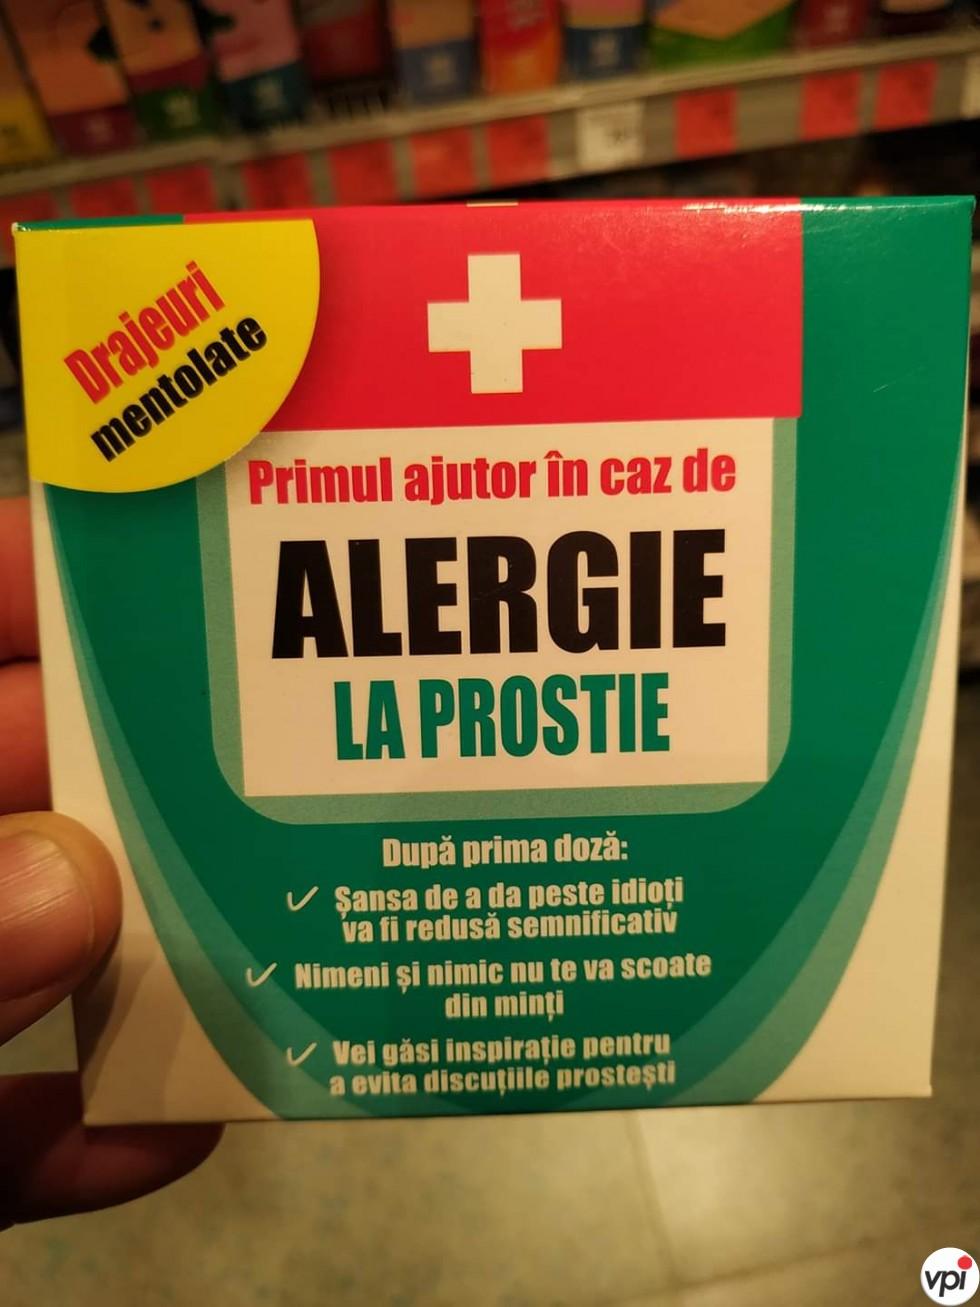 Alergie la prostie